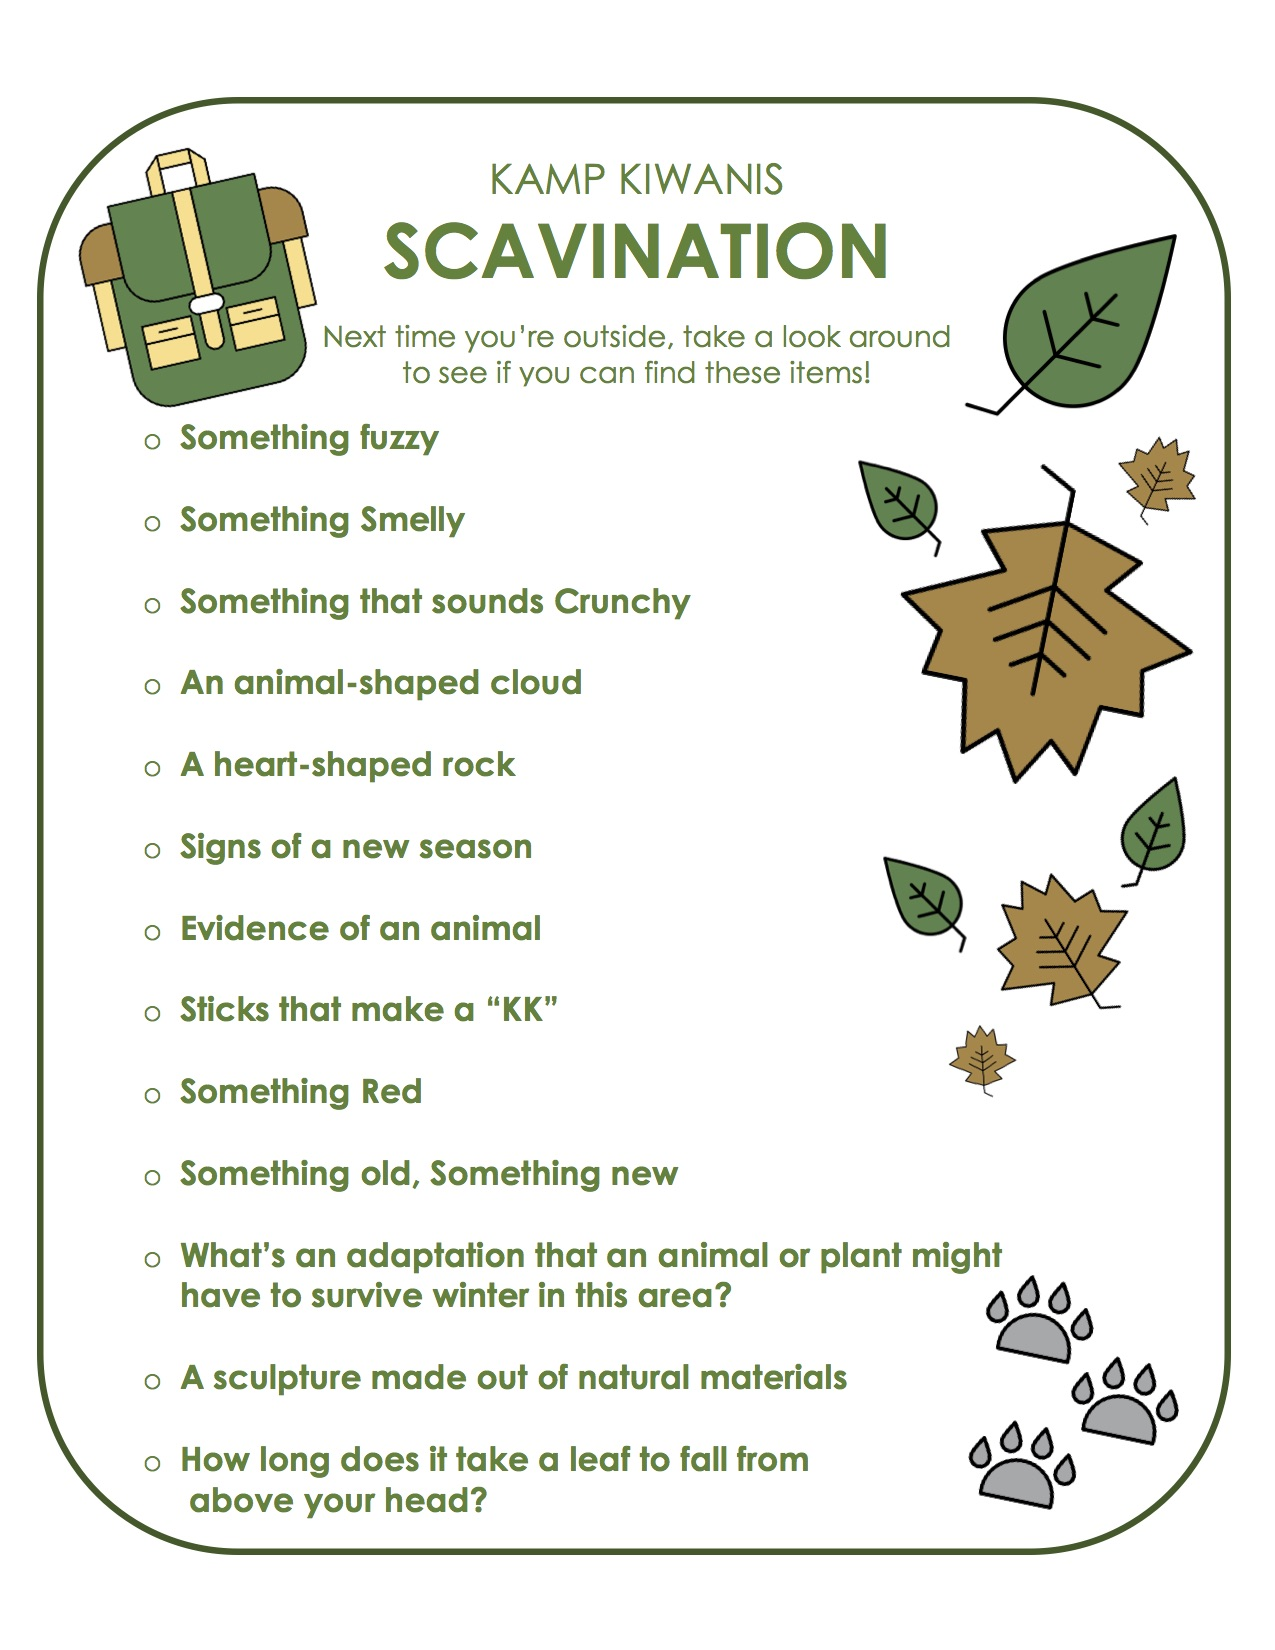 Scavination List